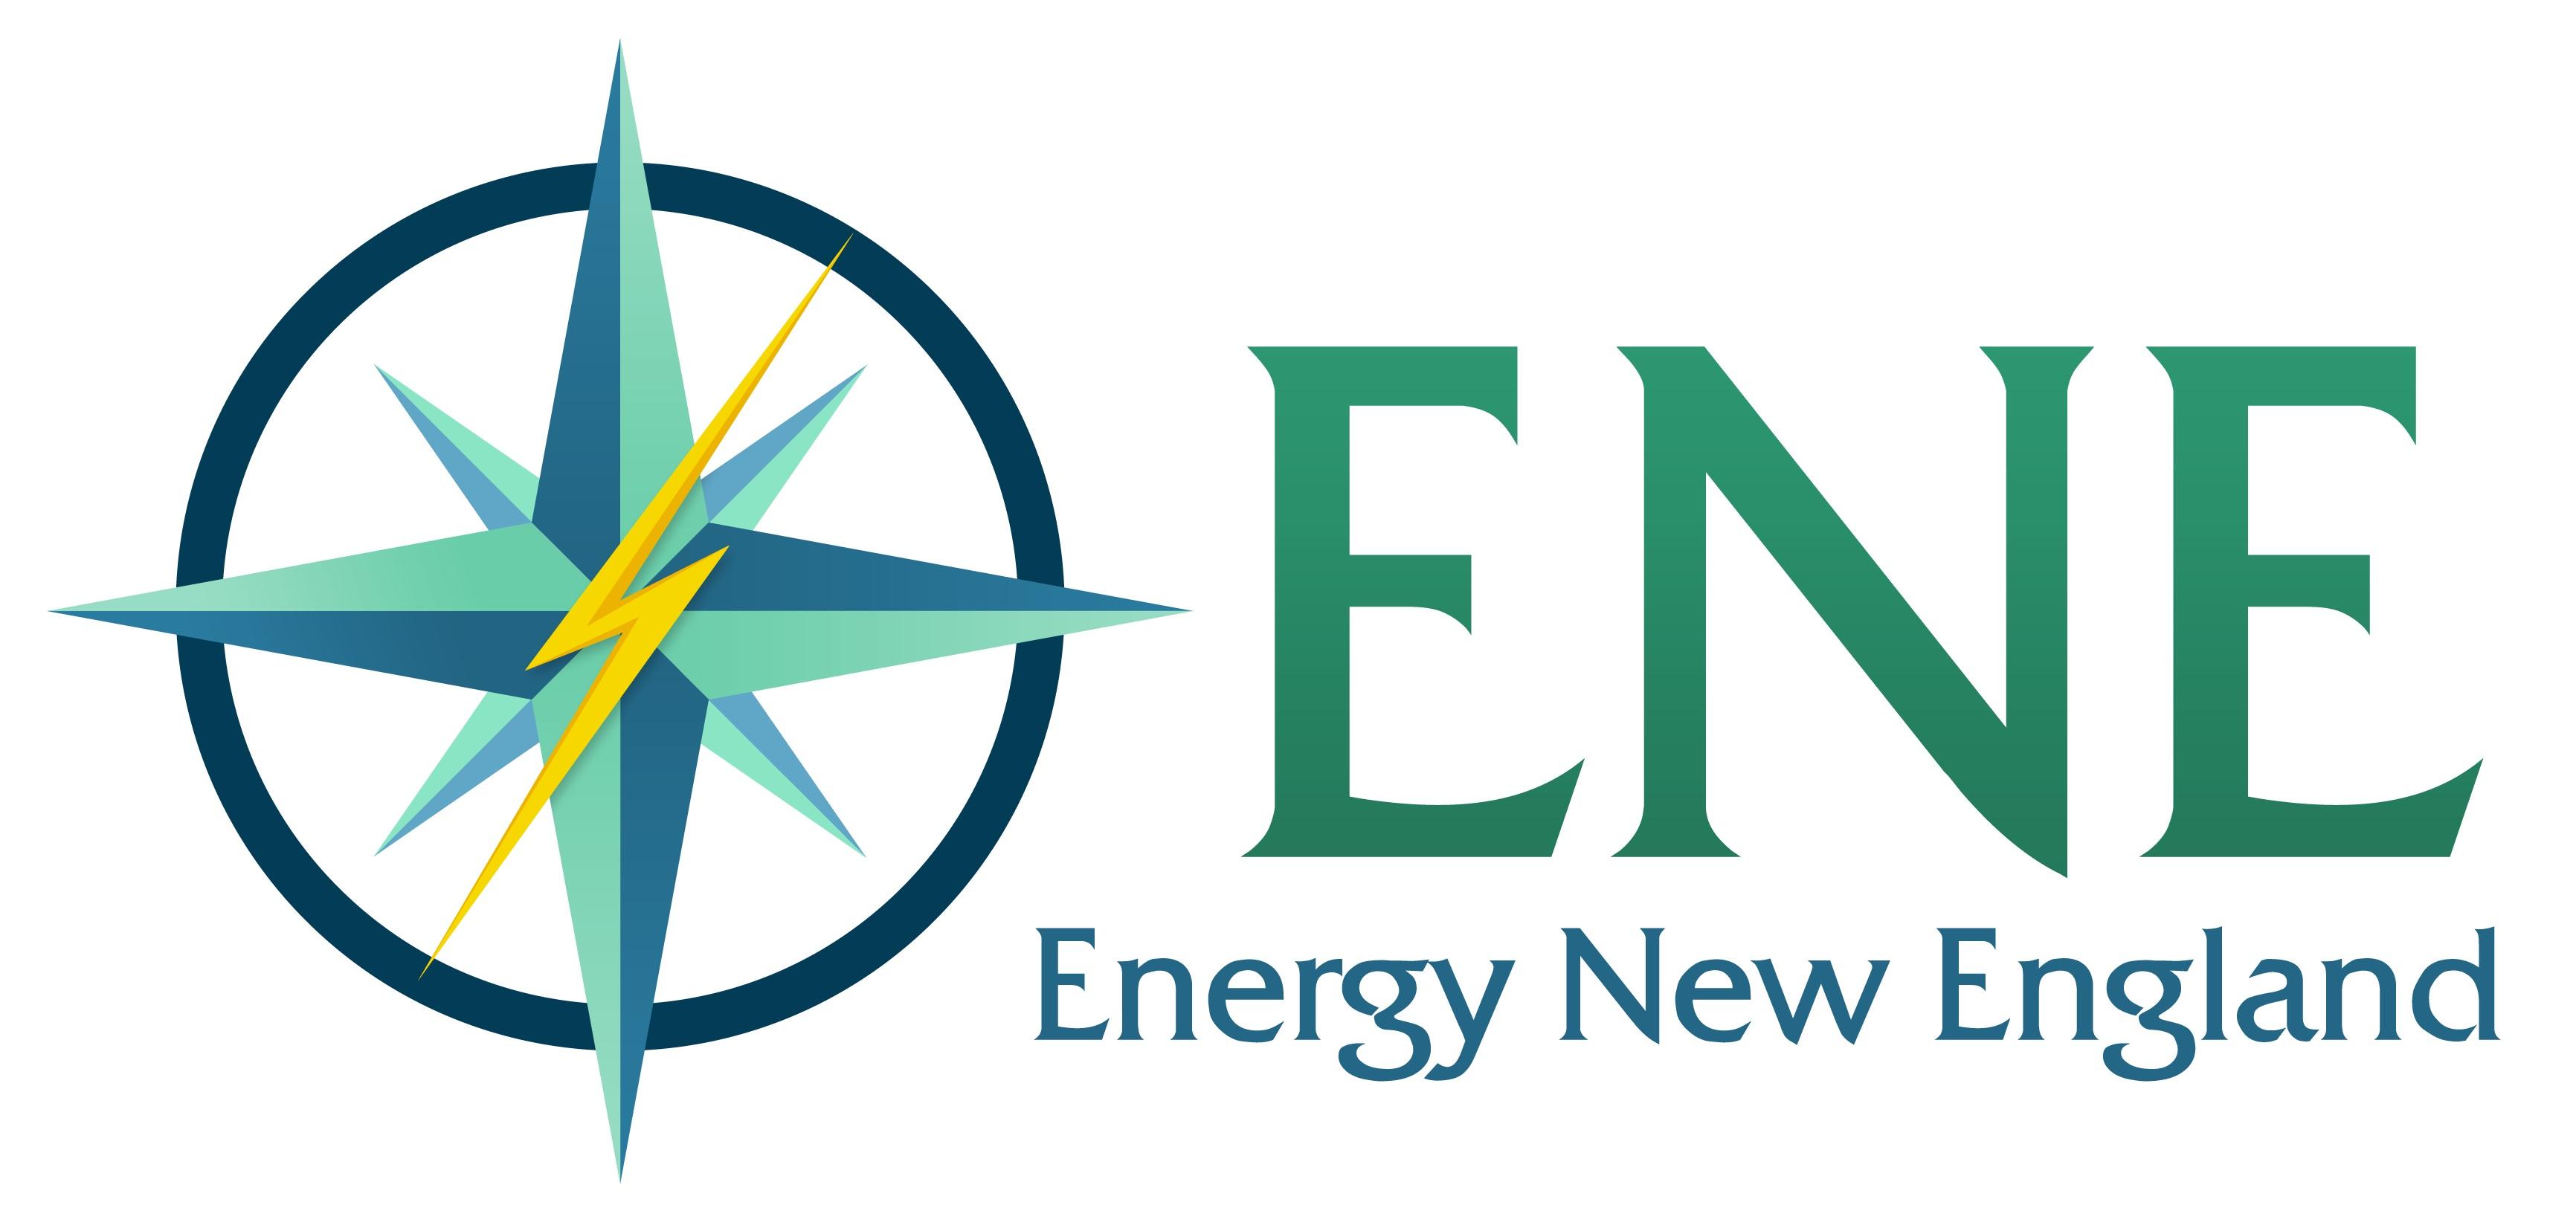 Energy New England logo